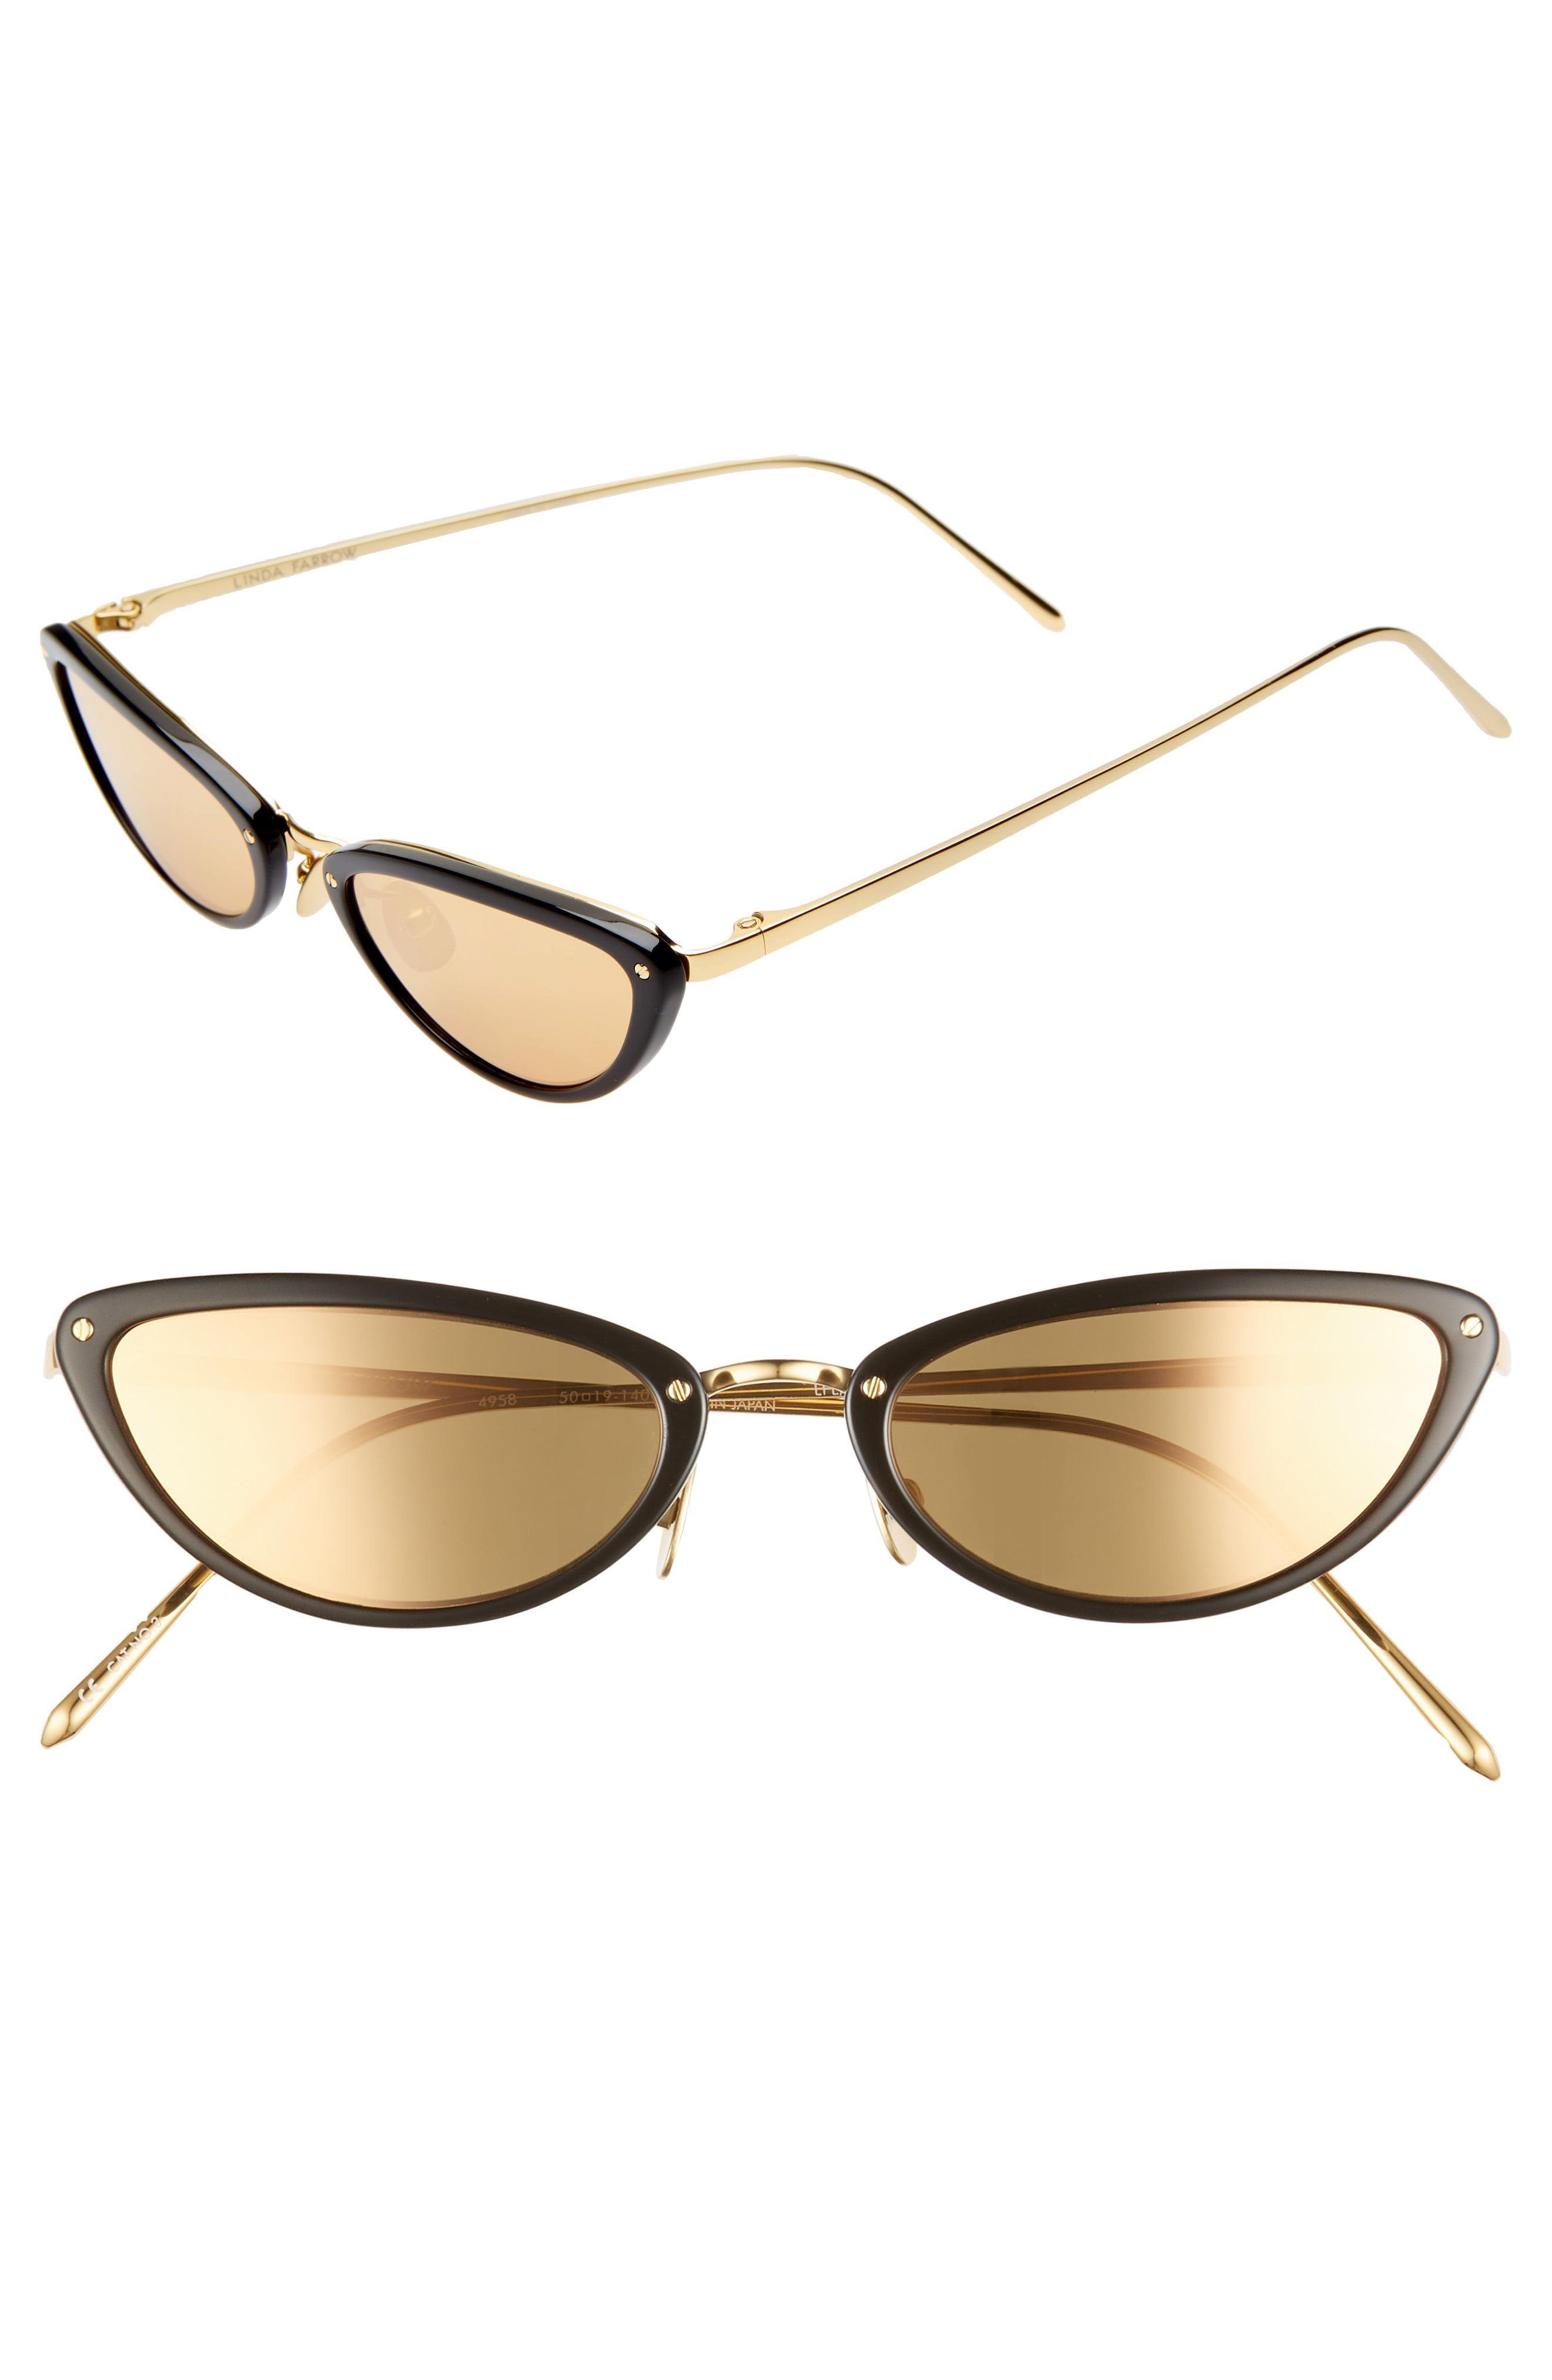 35966c7a570 Lyst - Linda Farrow 50mm Cat Eye Gold Trim Sunglasses in Metallic